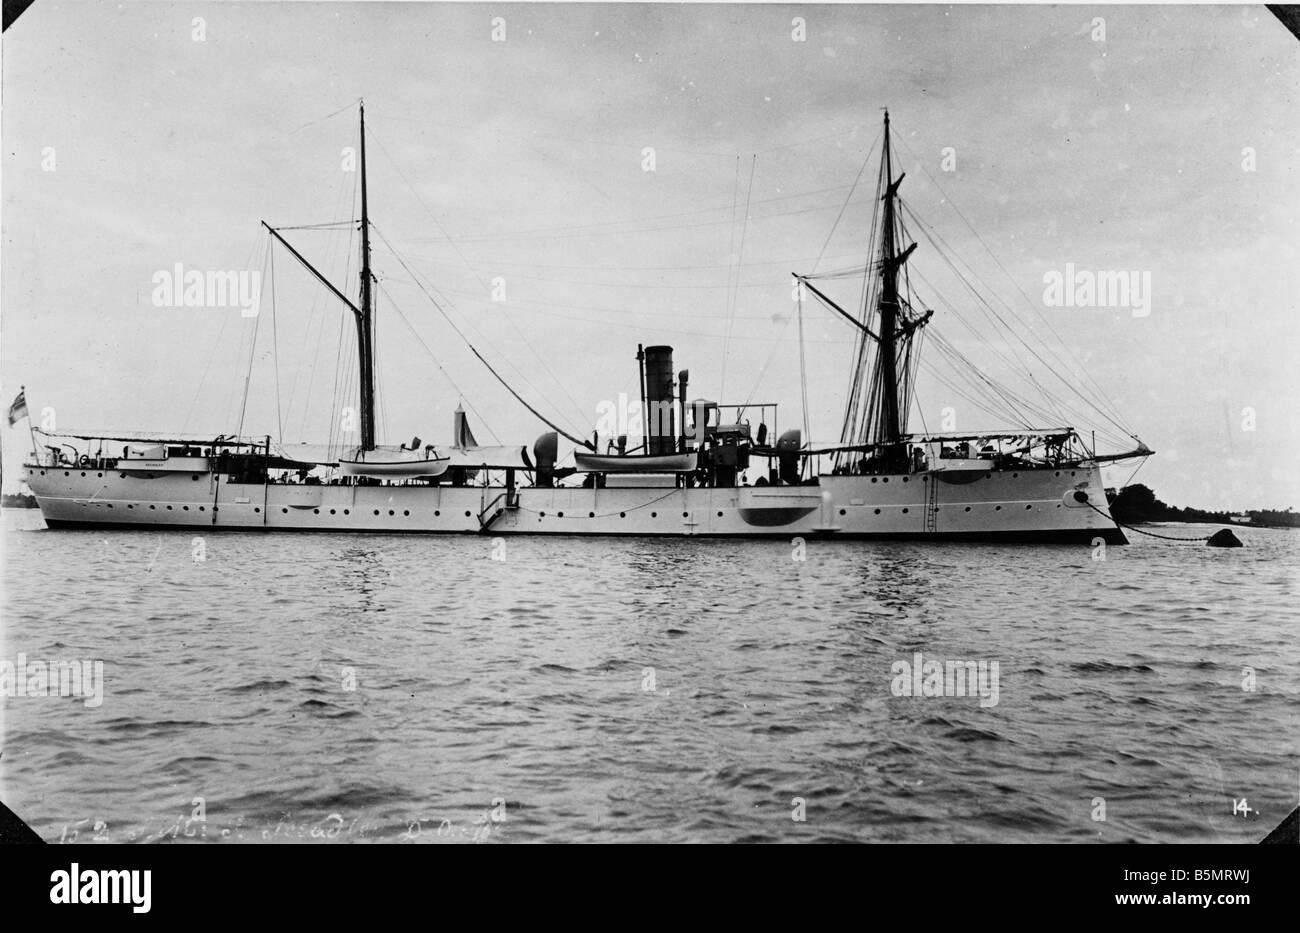 9AF 1914 0 0 A8 2 S M S Seeadler Daressalam Photo German East Africa Tanzania ora come una colonia tedesca 1884 1920 S M S Seeadler in Foto Stock